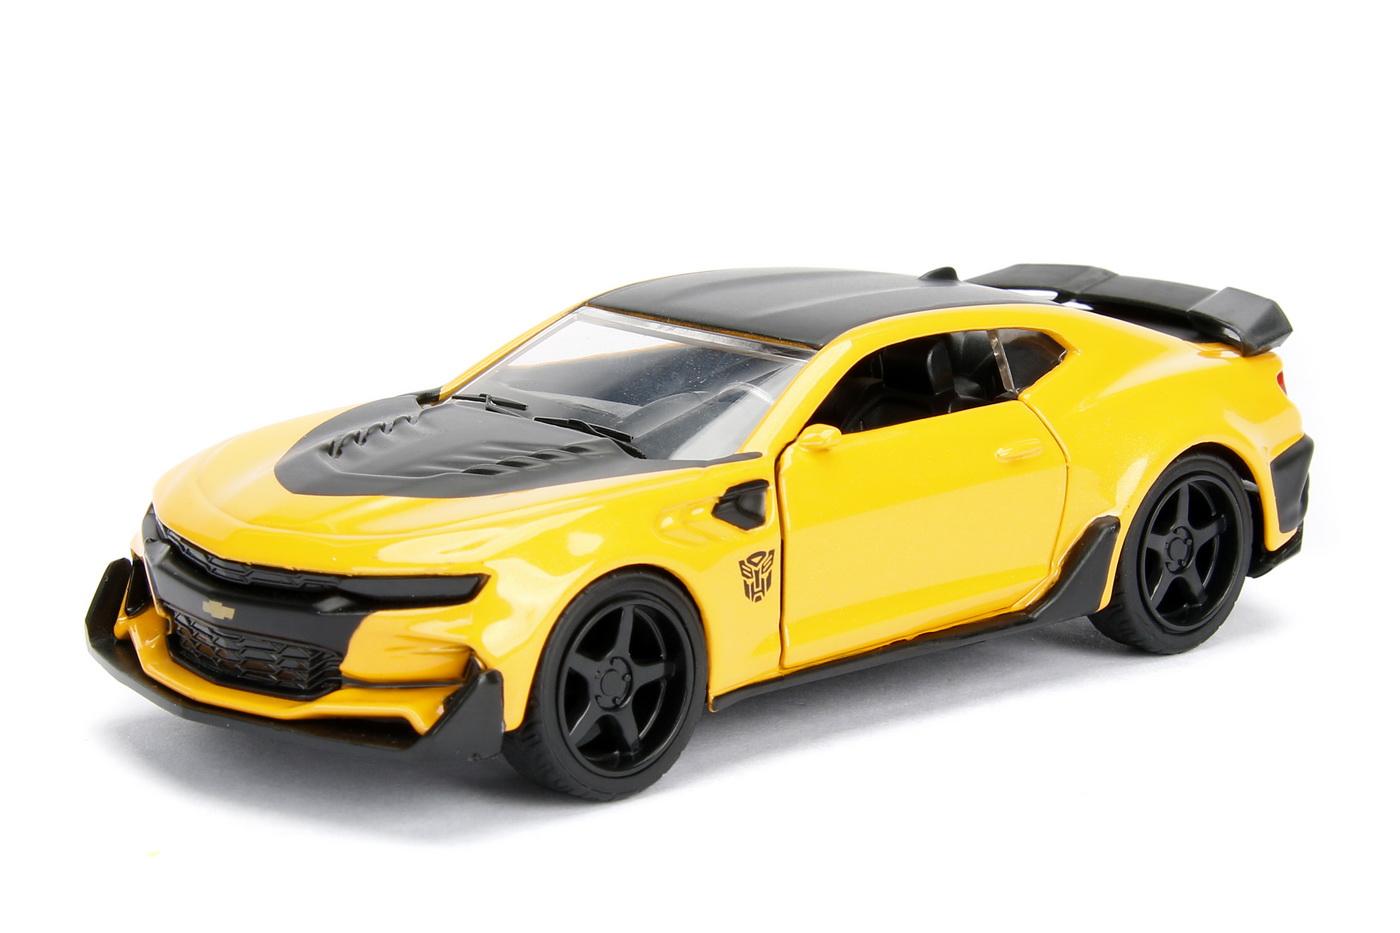 Masinuta Metalica Transformers 2016 Chevy Camaro Scara 1 La 32   JadaToys - 1